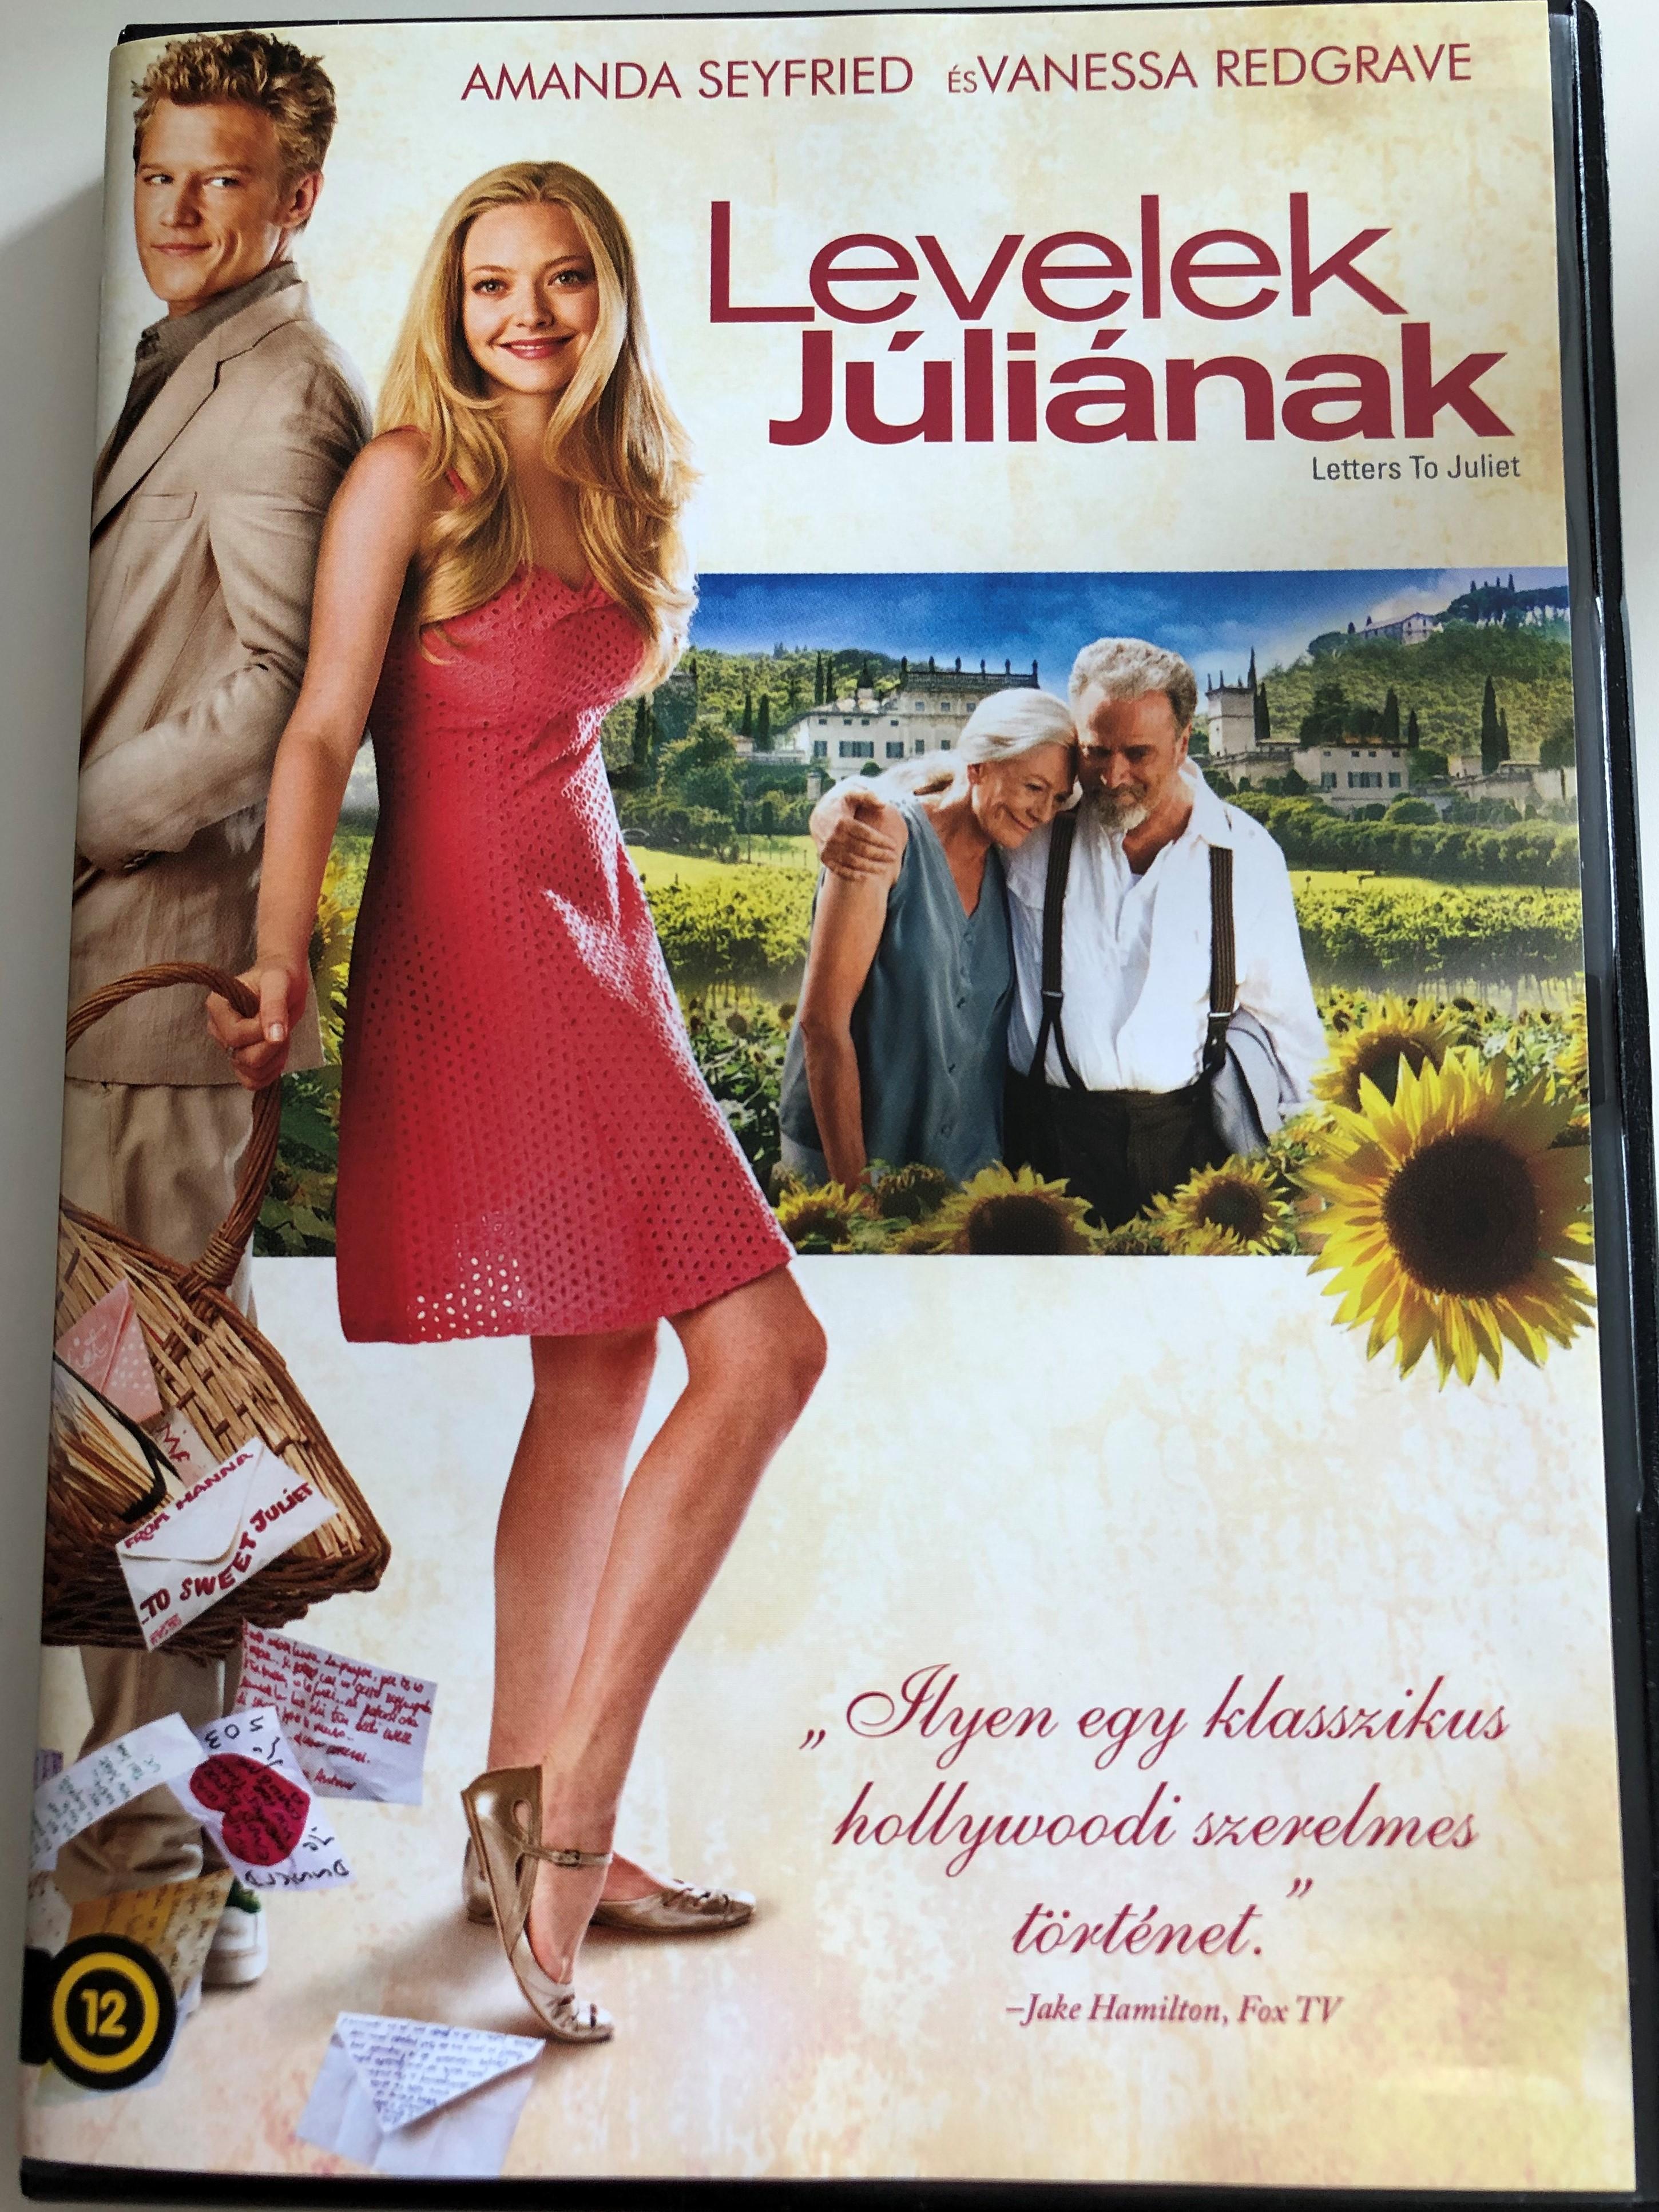 letters-to-juliet-dvd-2010-levelek-j-li-nak-directed-by-gary-winick-starring-a-amda-seyfried-christopher-egan-gael-garc-a-bernal-vanessa-redgrave-1-.jpg